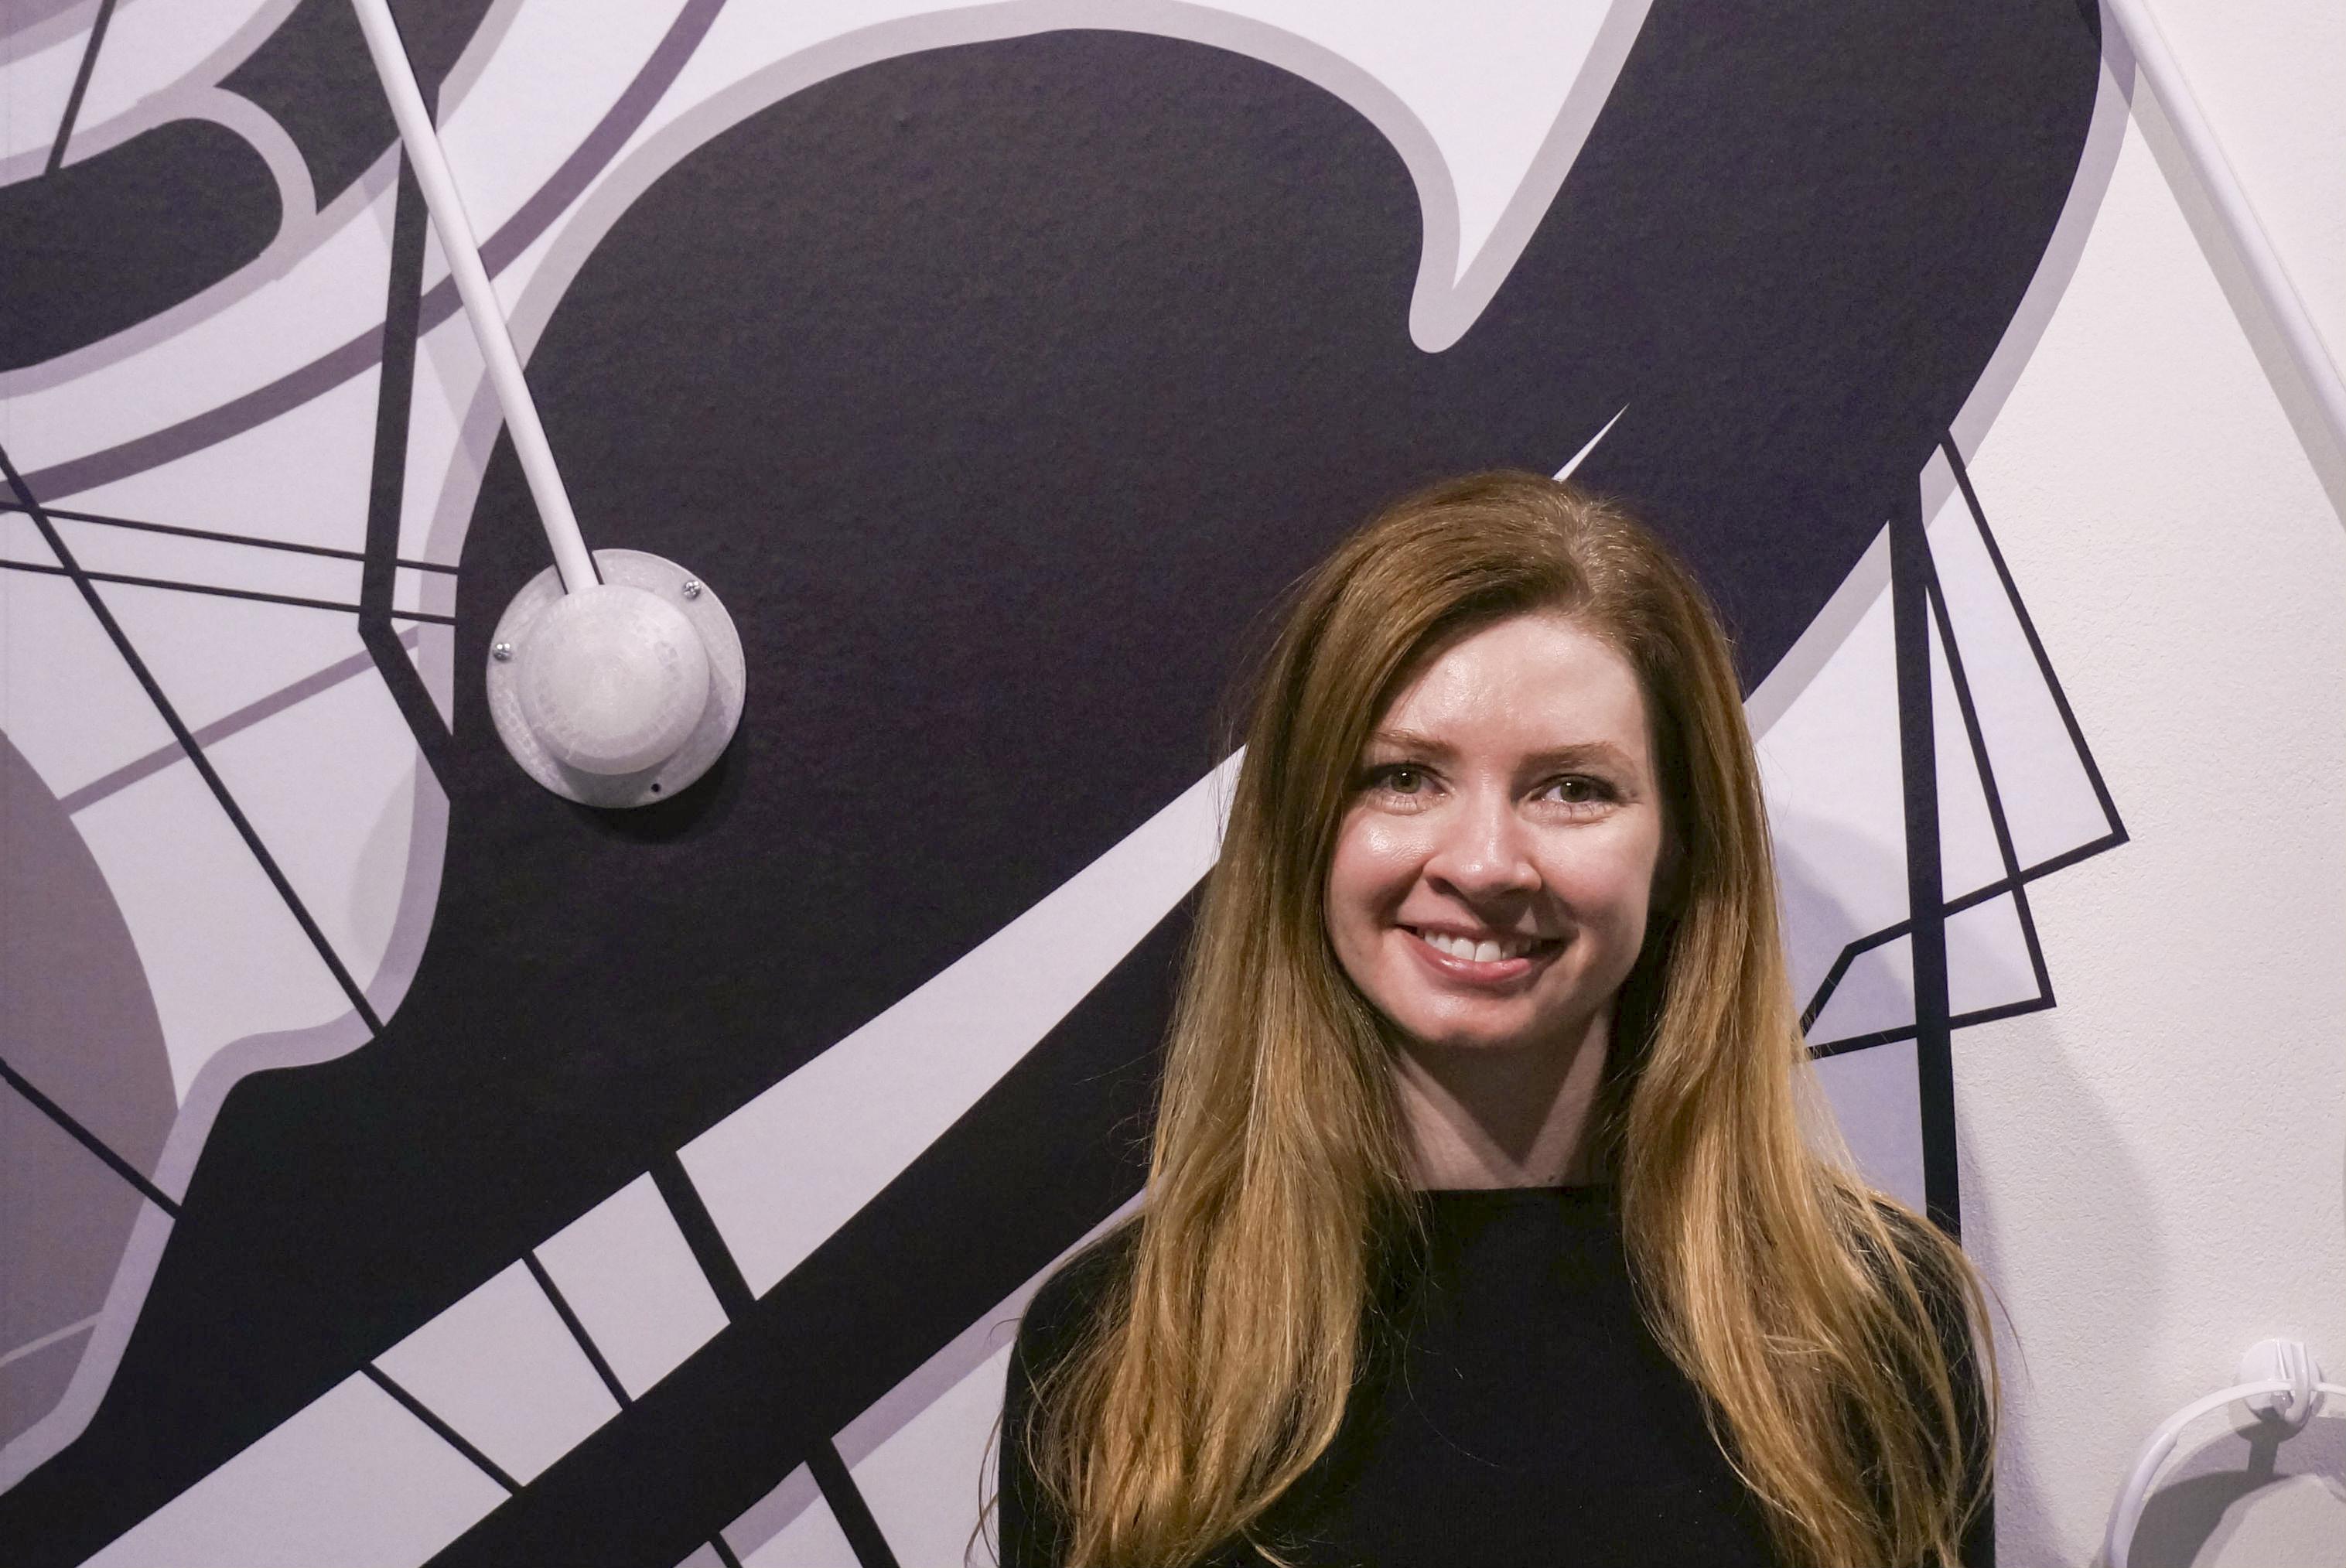 Photo: Sarah Richter, Denver artist with MS